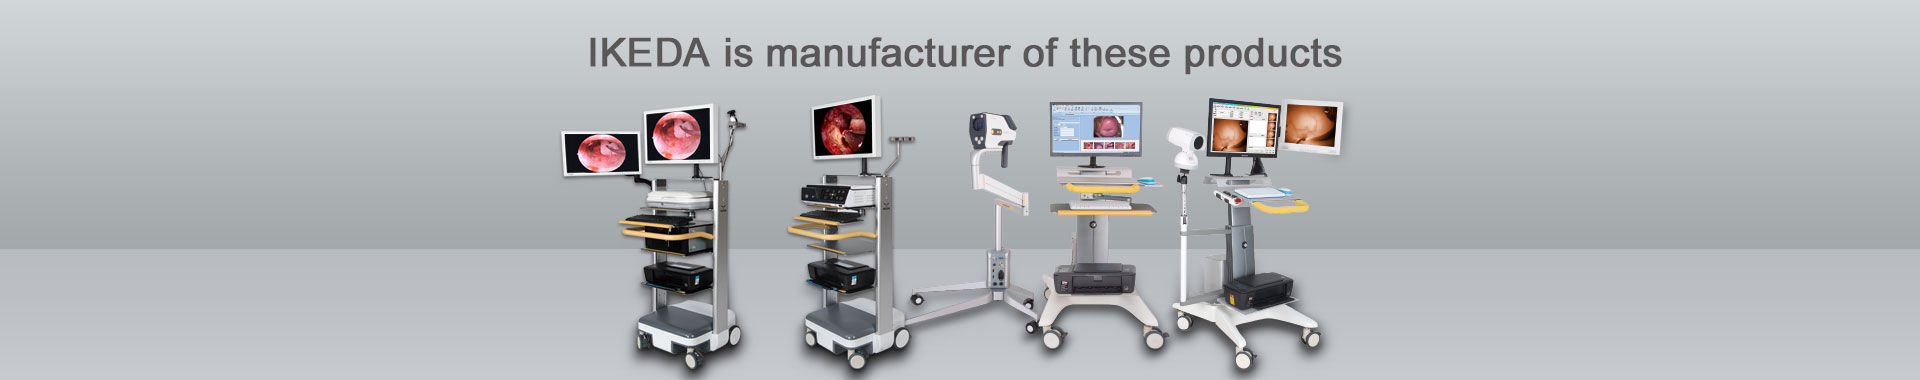 Endoscope Camera, Colposcope, Trolley, Accessory